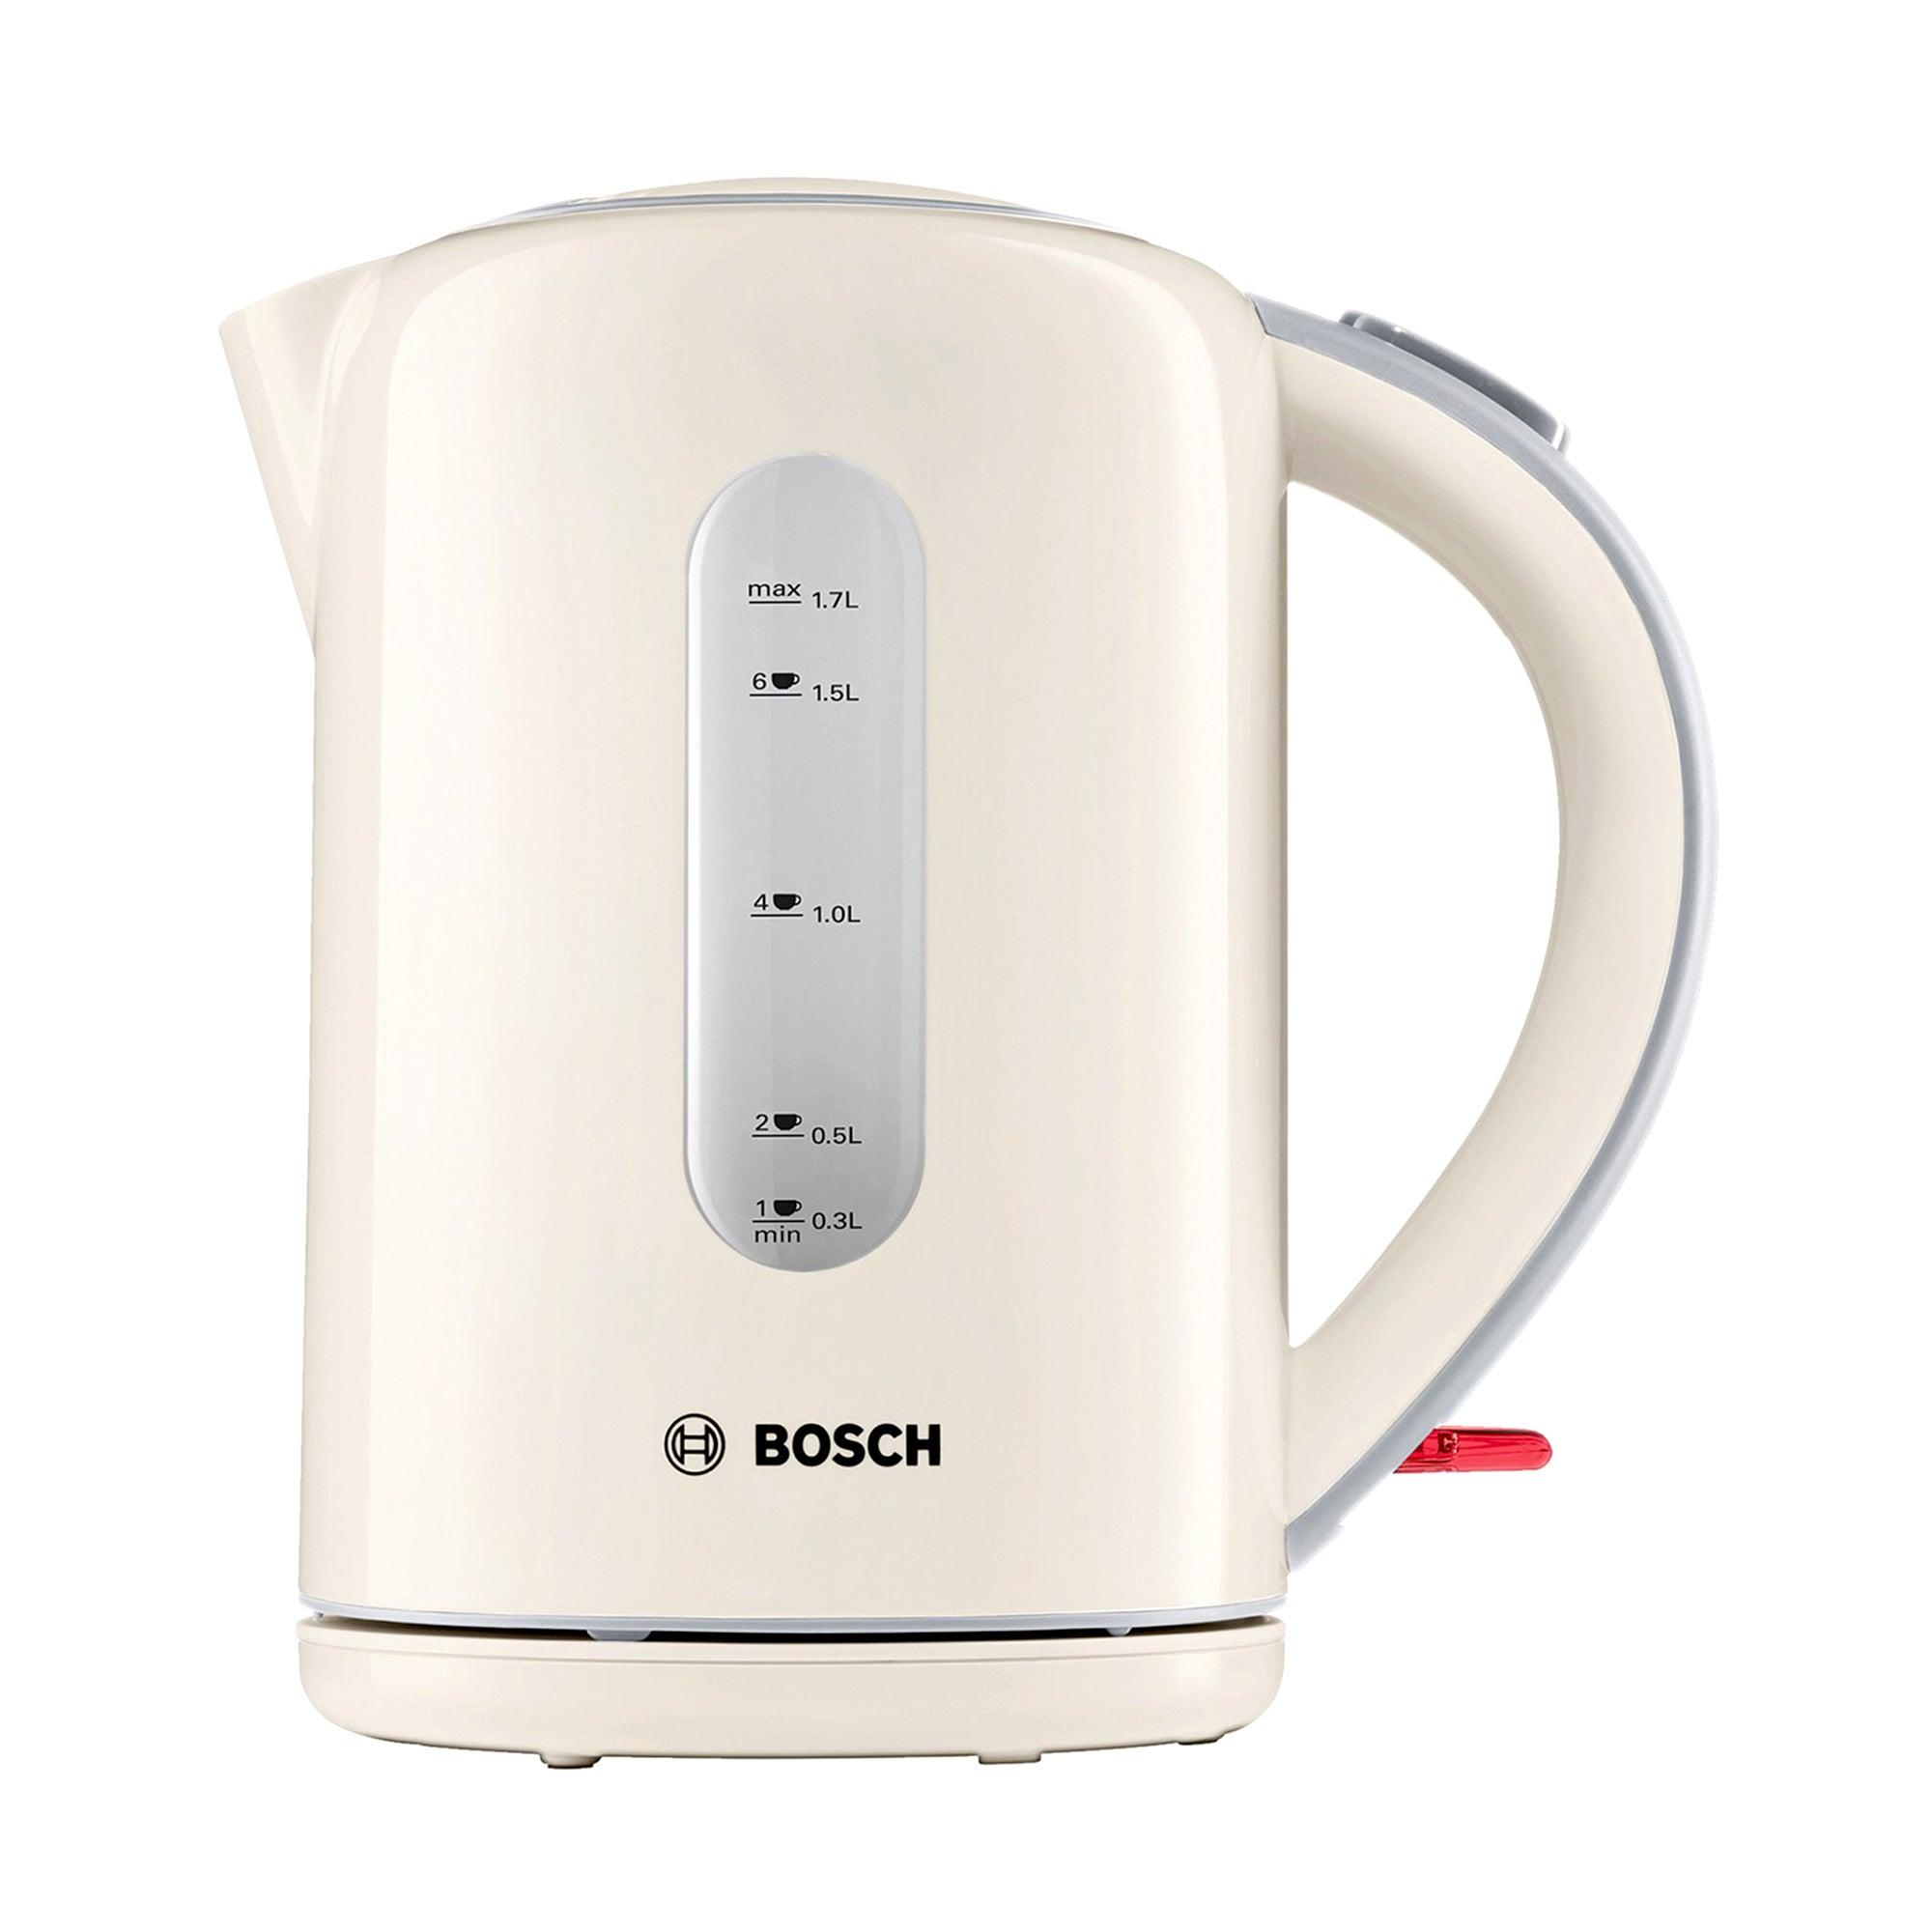 Bosch Village TWK7607GB 1.7L Cream Kettle Cream